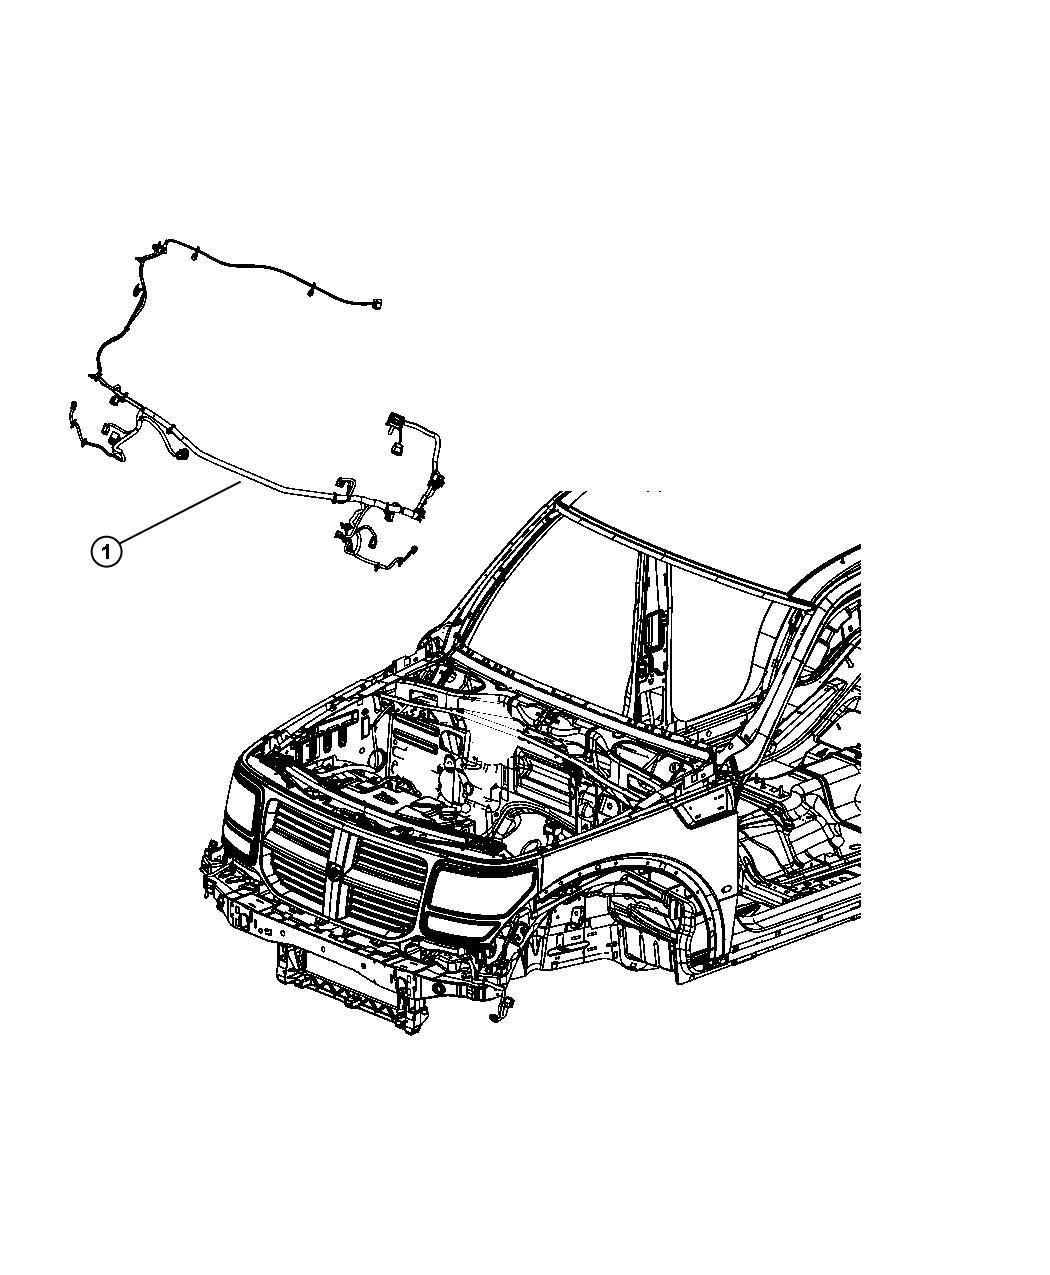 Dodge Nitro Wiring. Front end lighting. [[-fog lamps